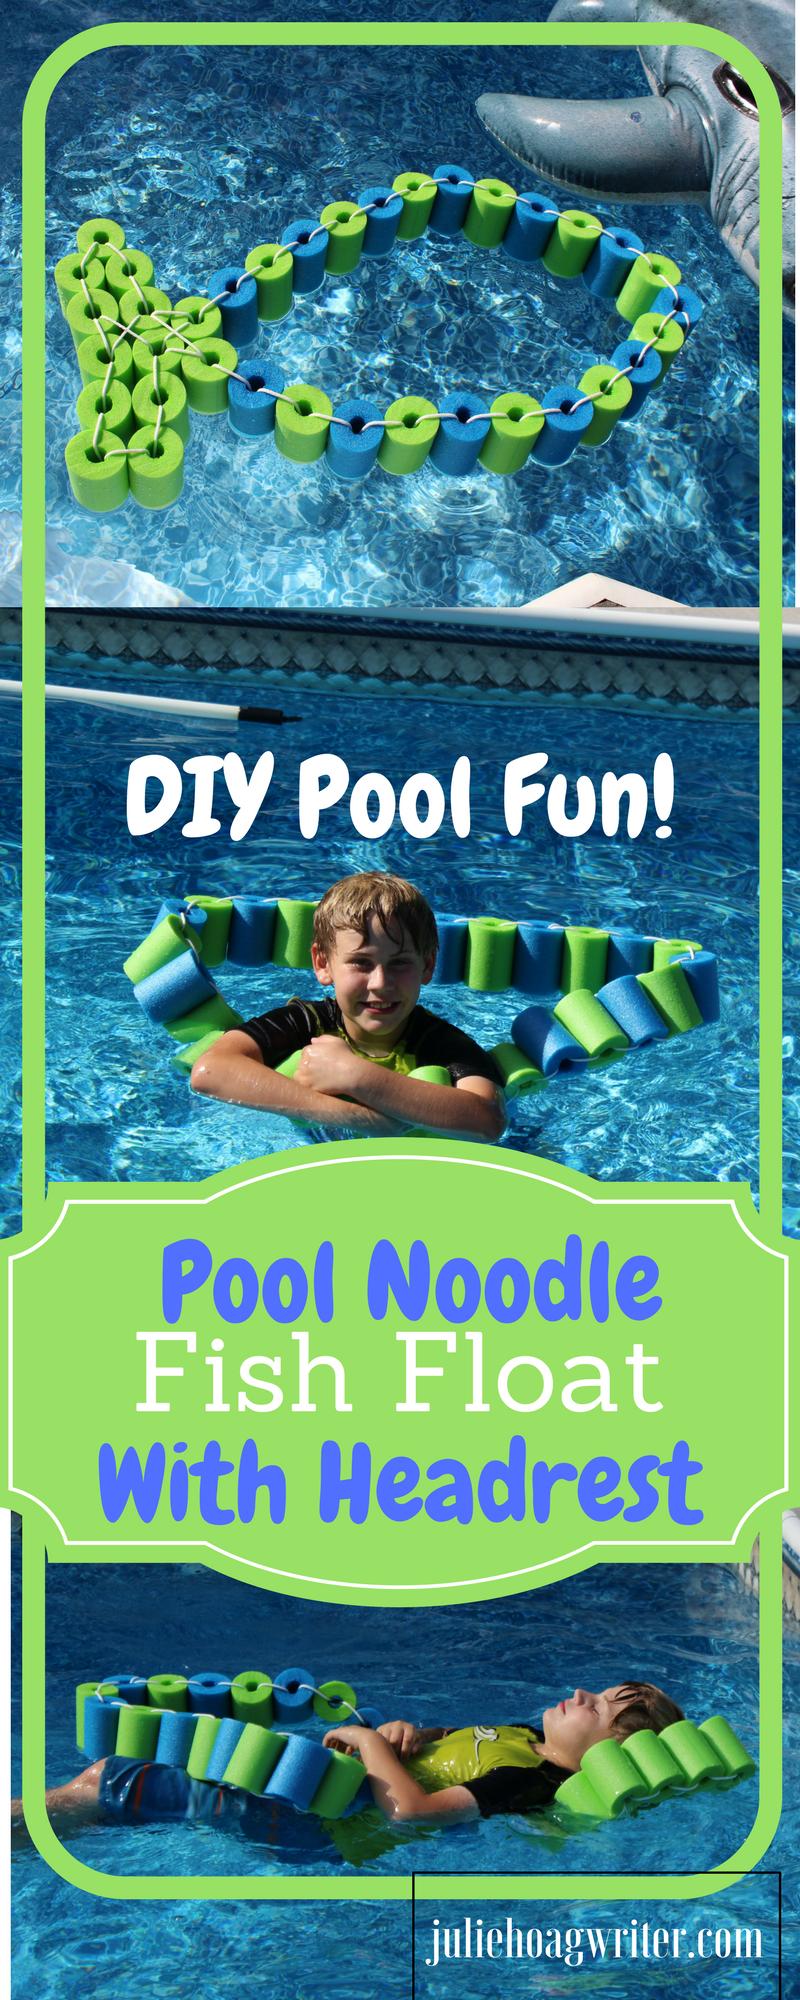 Diy Pool Noodle Fish Float With Headrest Pool Toys For Kids Kid Pool Diy Pool